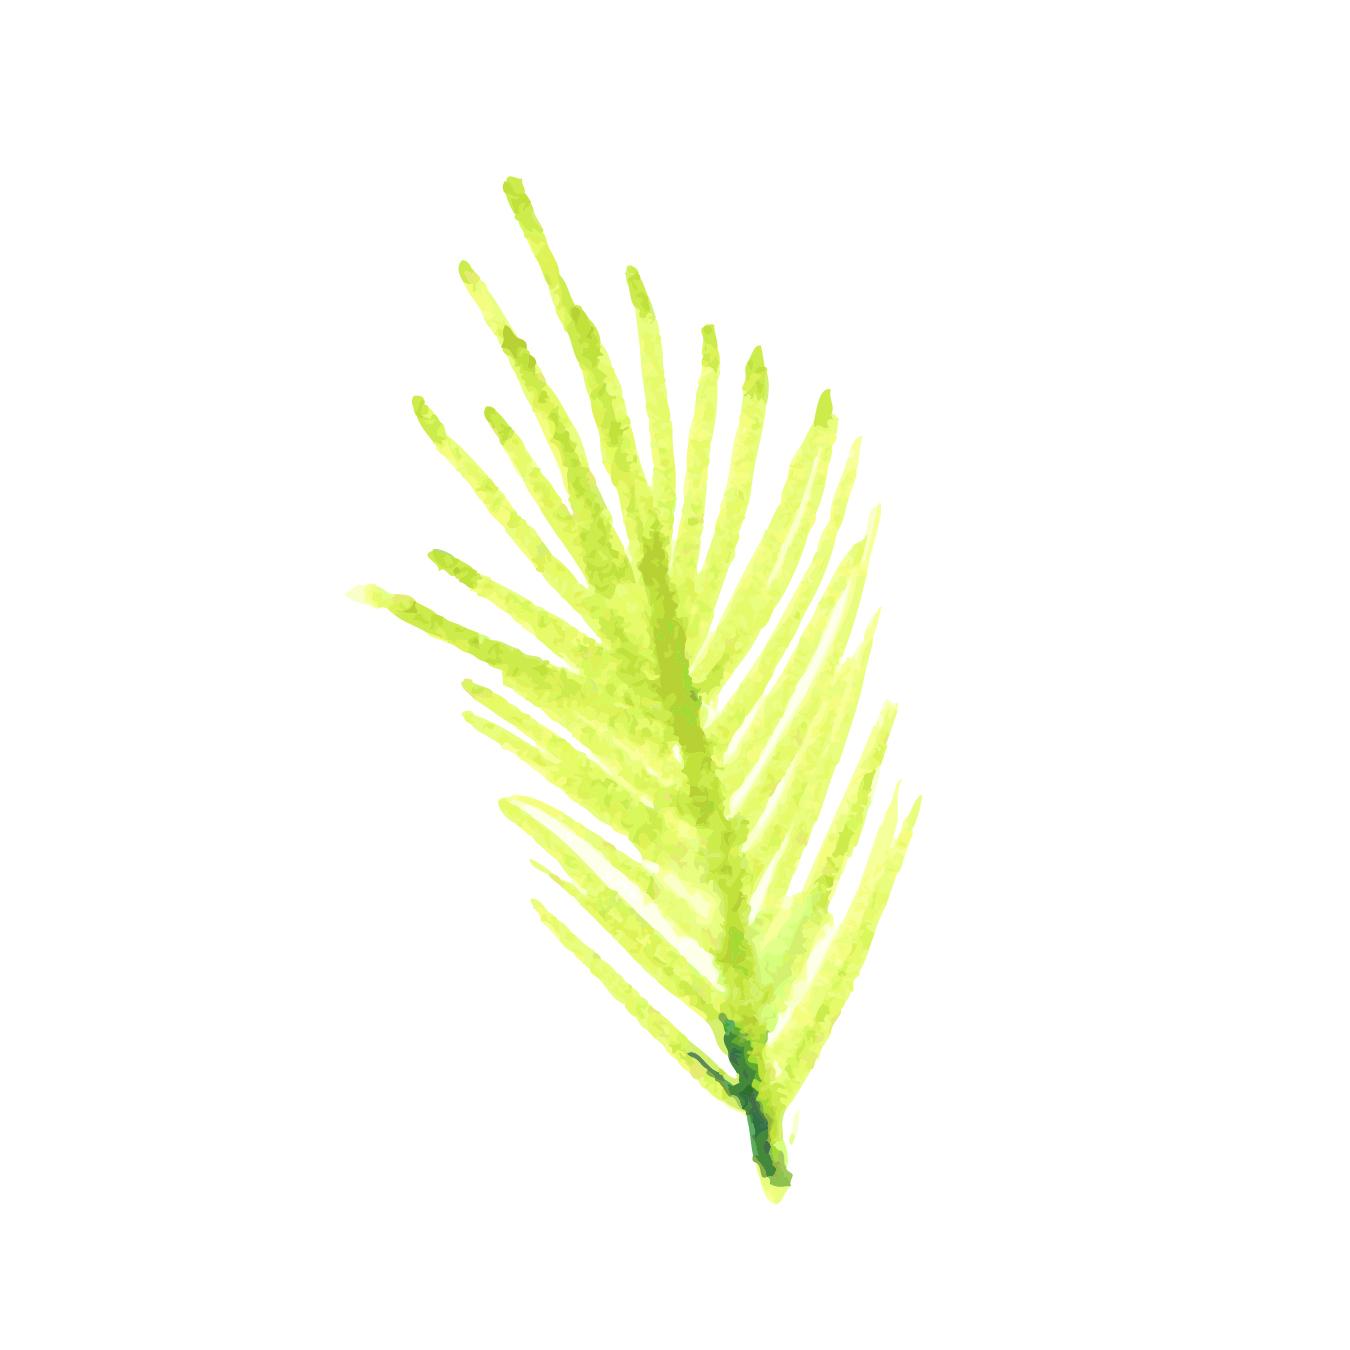 Tropicla Breeze clip art bundle example image 13